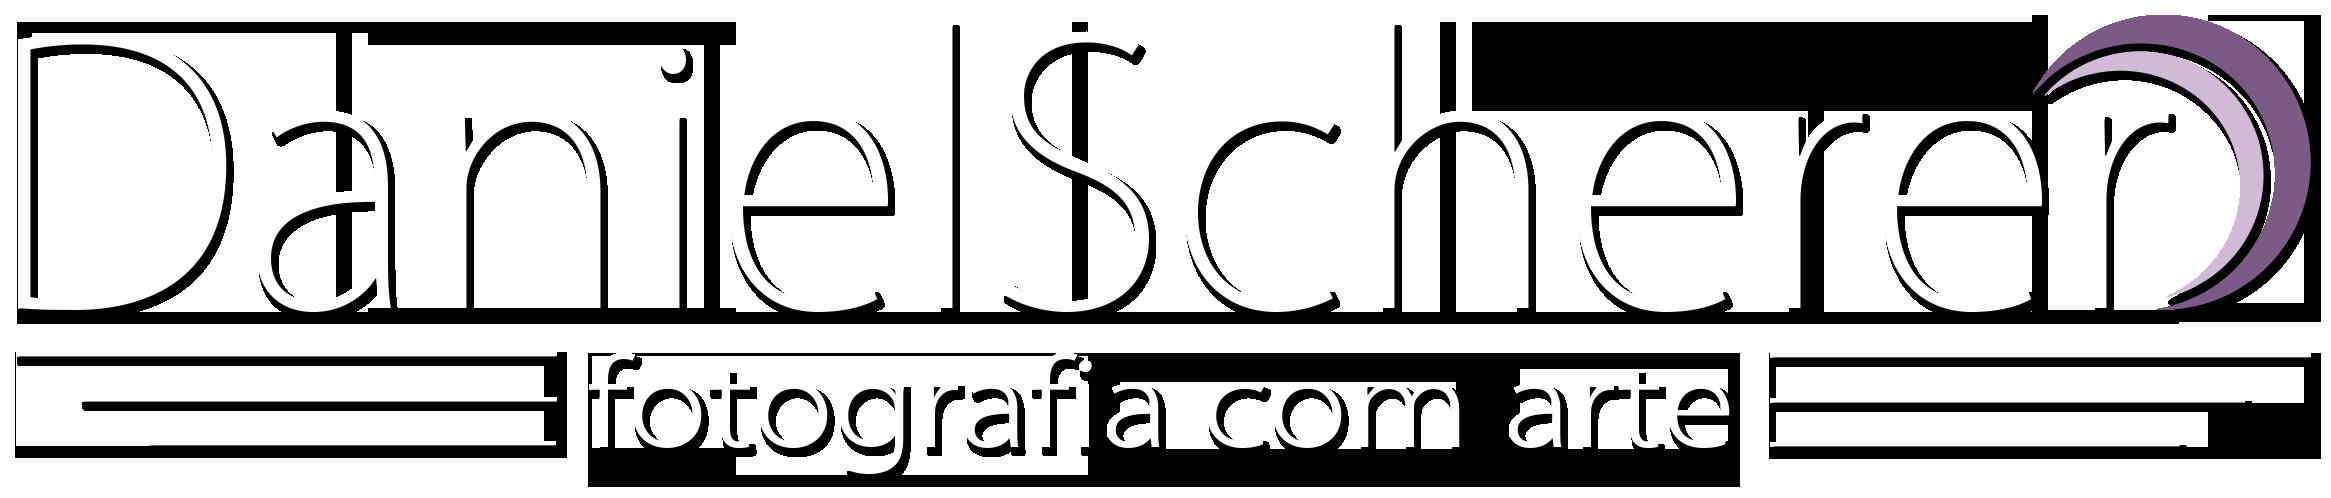 Logotipo de Daniel Scherer